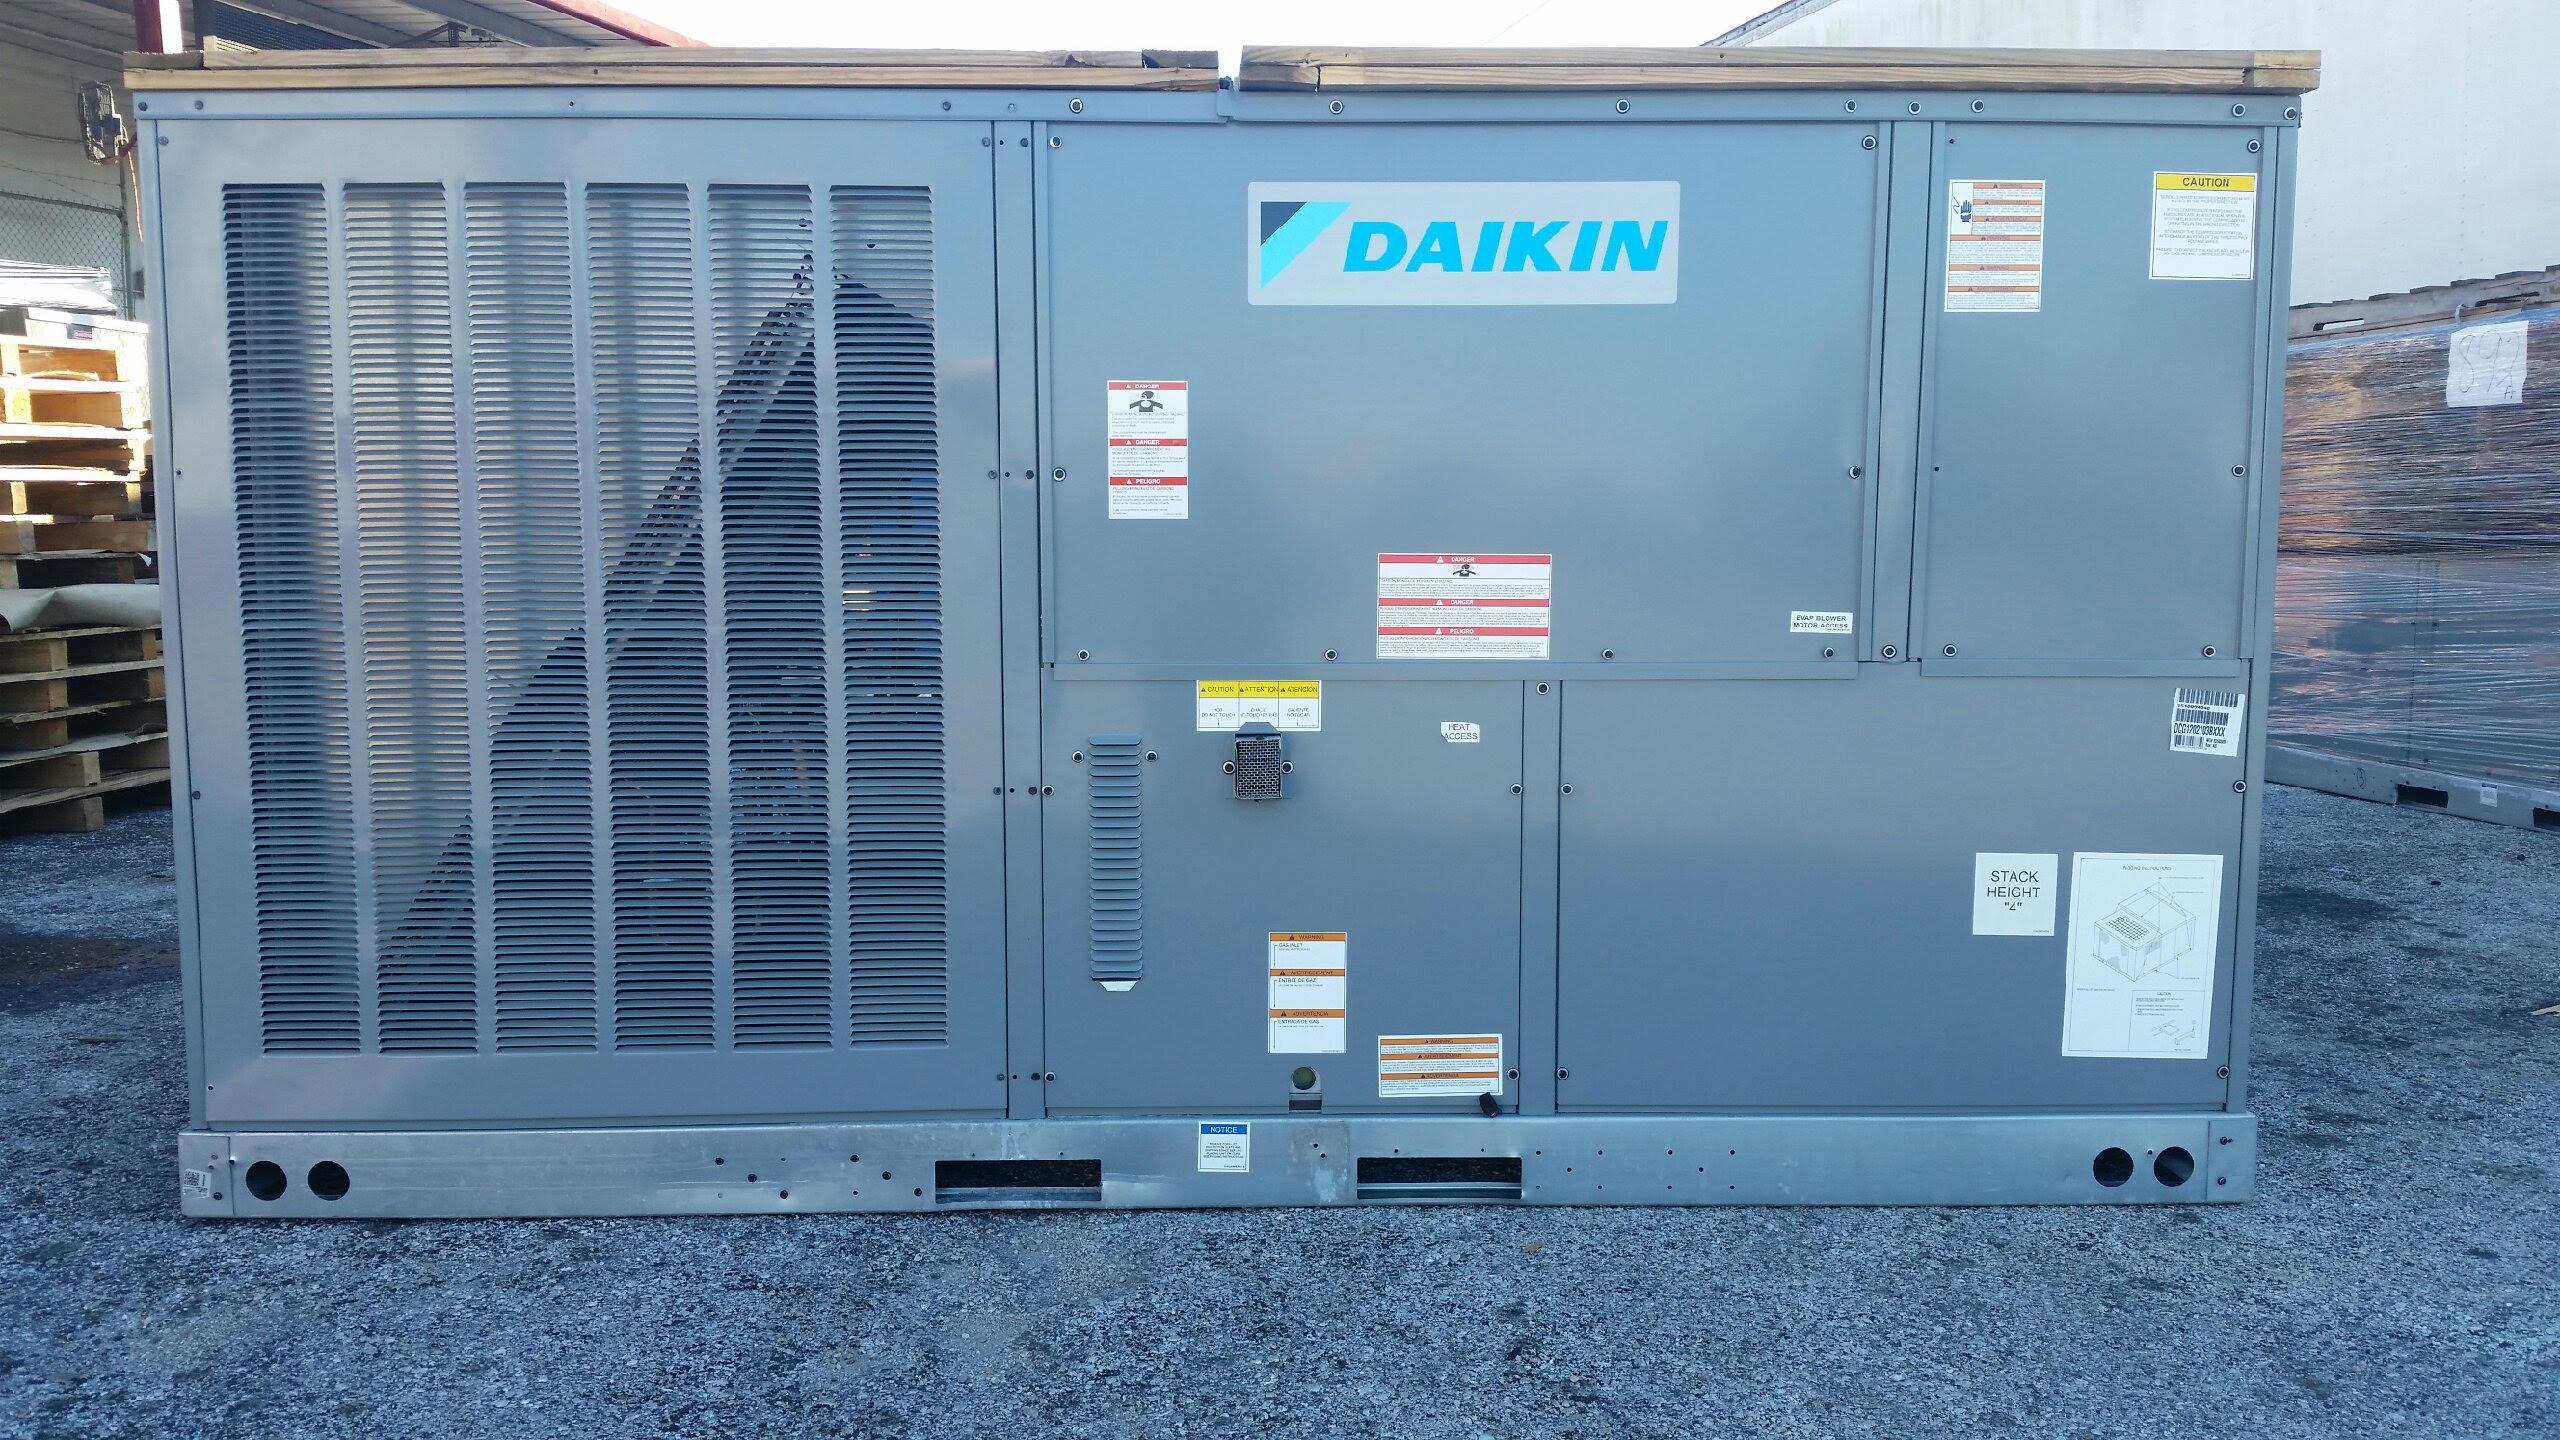 daikin split ac 1 5 ton wiring diagram onan generator starter 10 gas package unit 210k btu 208 230v or 460v 3